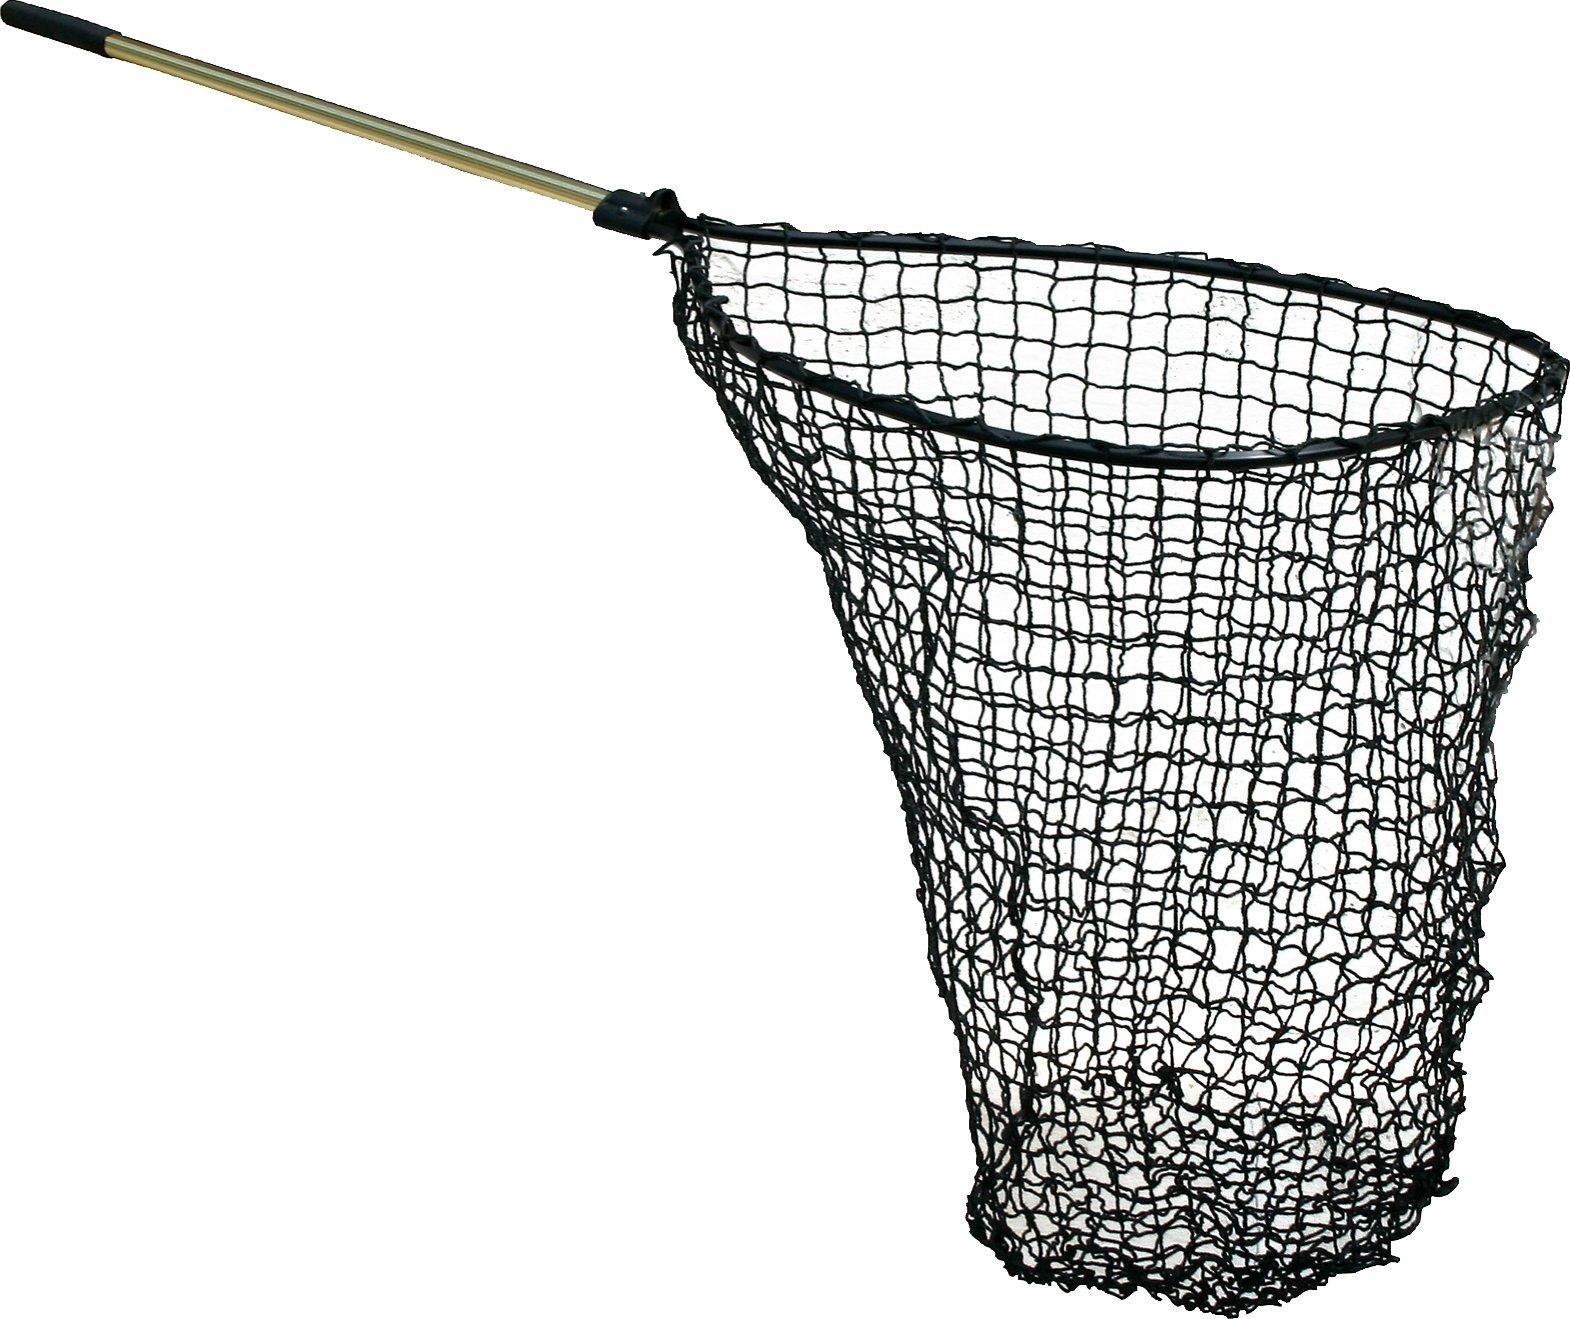 Frabill 8450 Power Catch Big Kahuna Teardrop Landing Net, 40 x 44-Inch